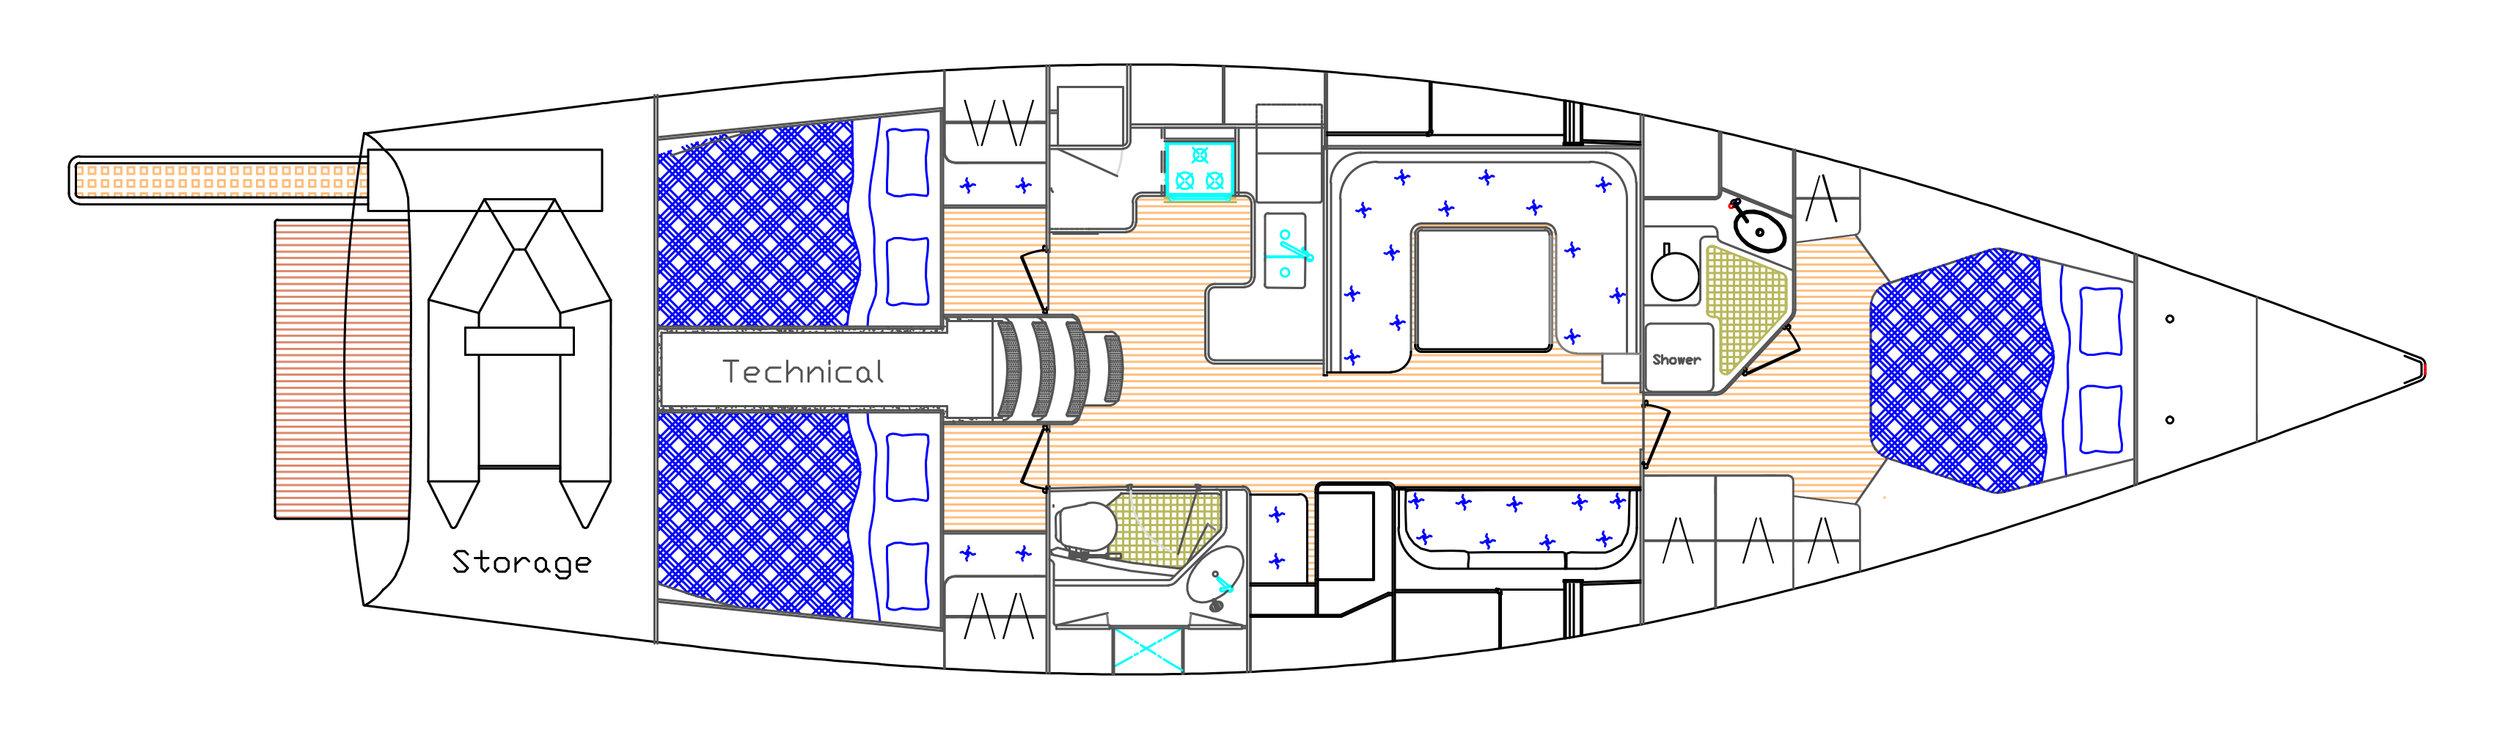 M49 Inerior layout wteak.jpg